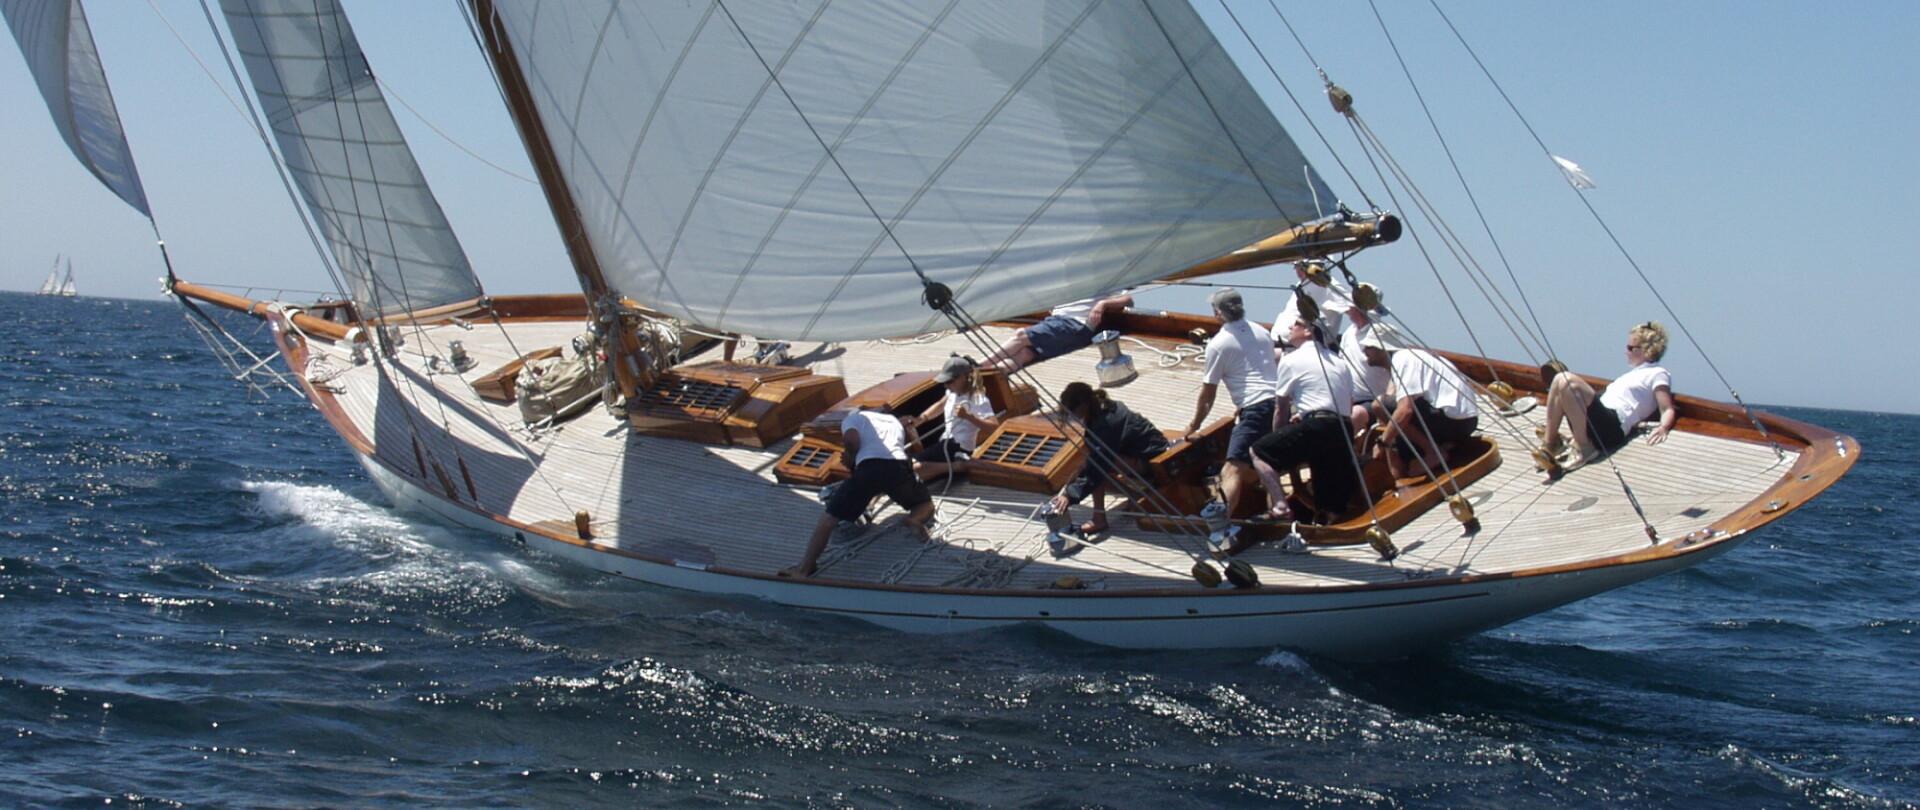 Edmiston Fleet Attend Regattas on the French Riviera photo 2